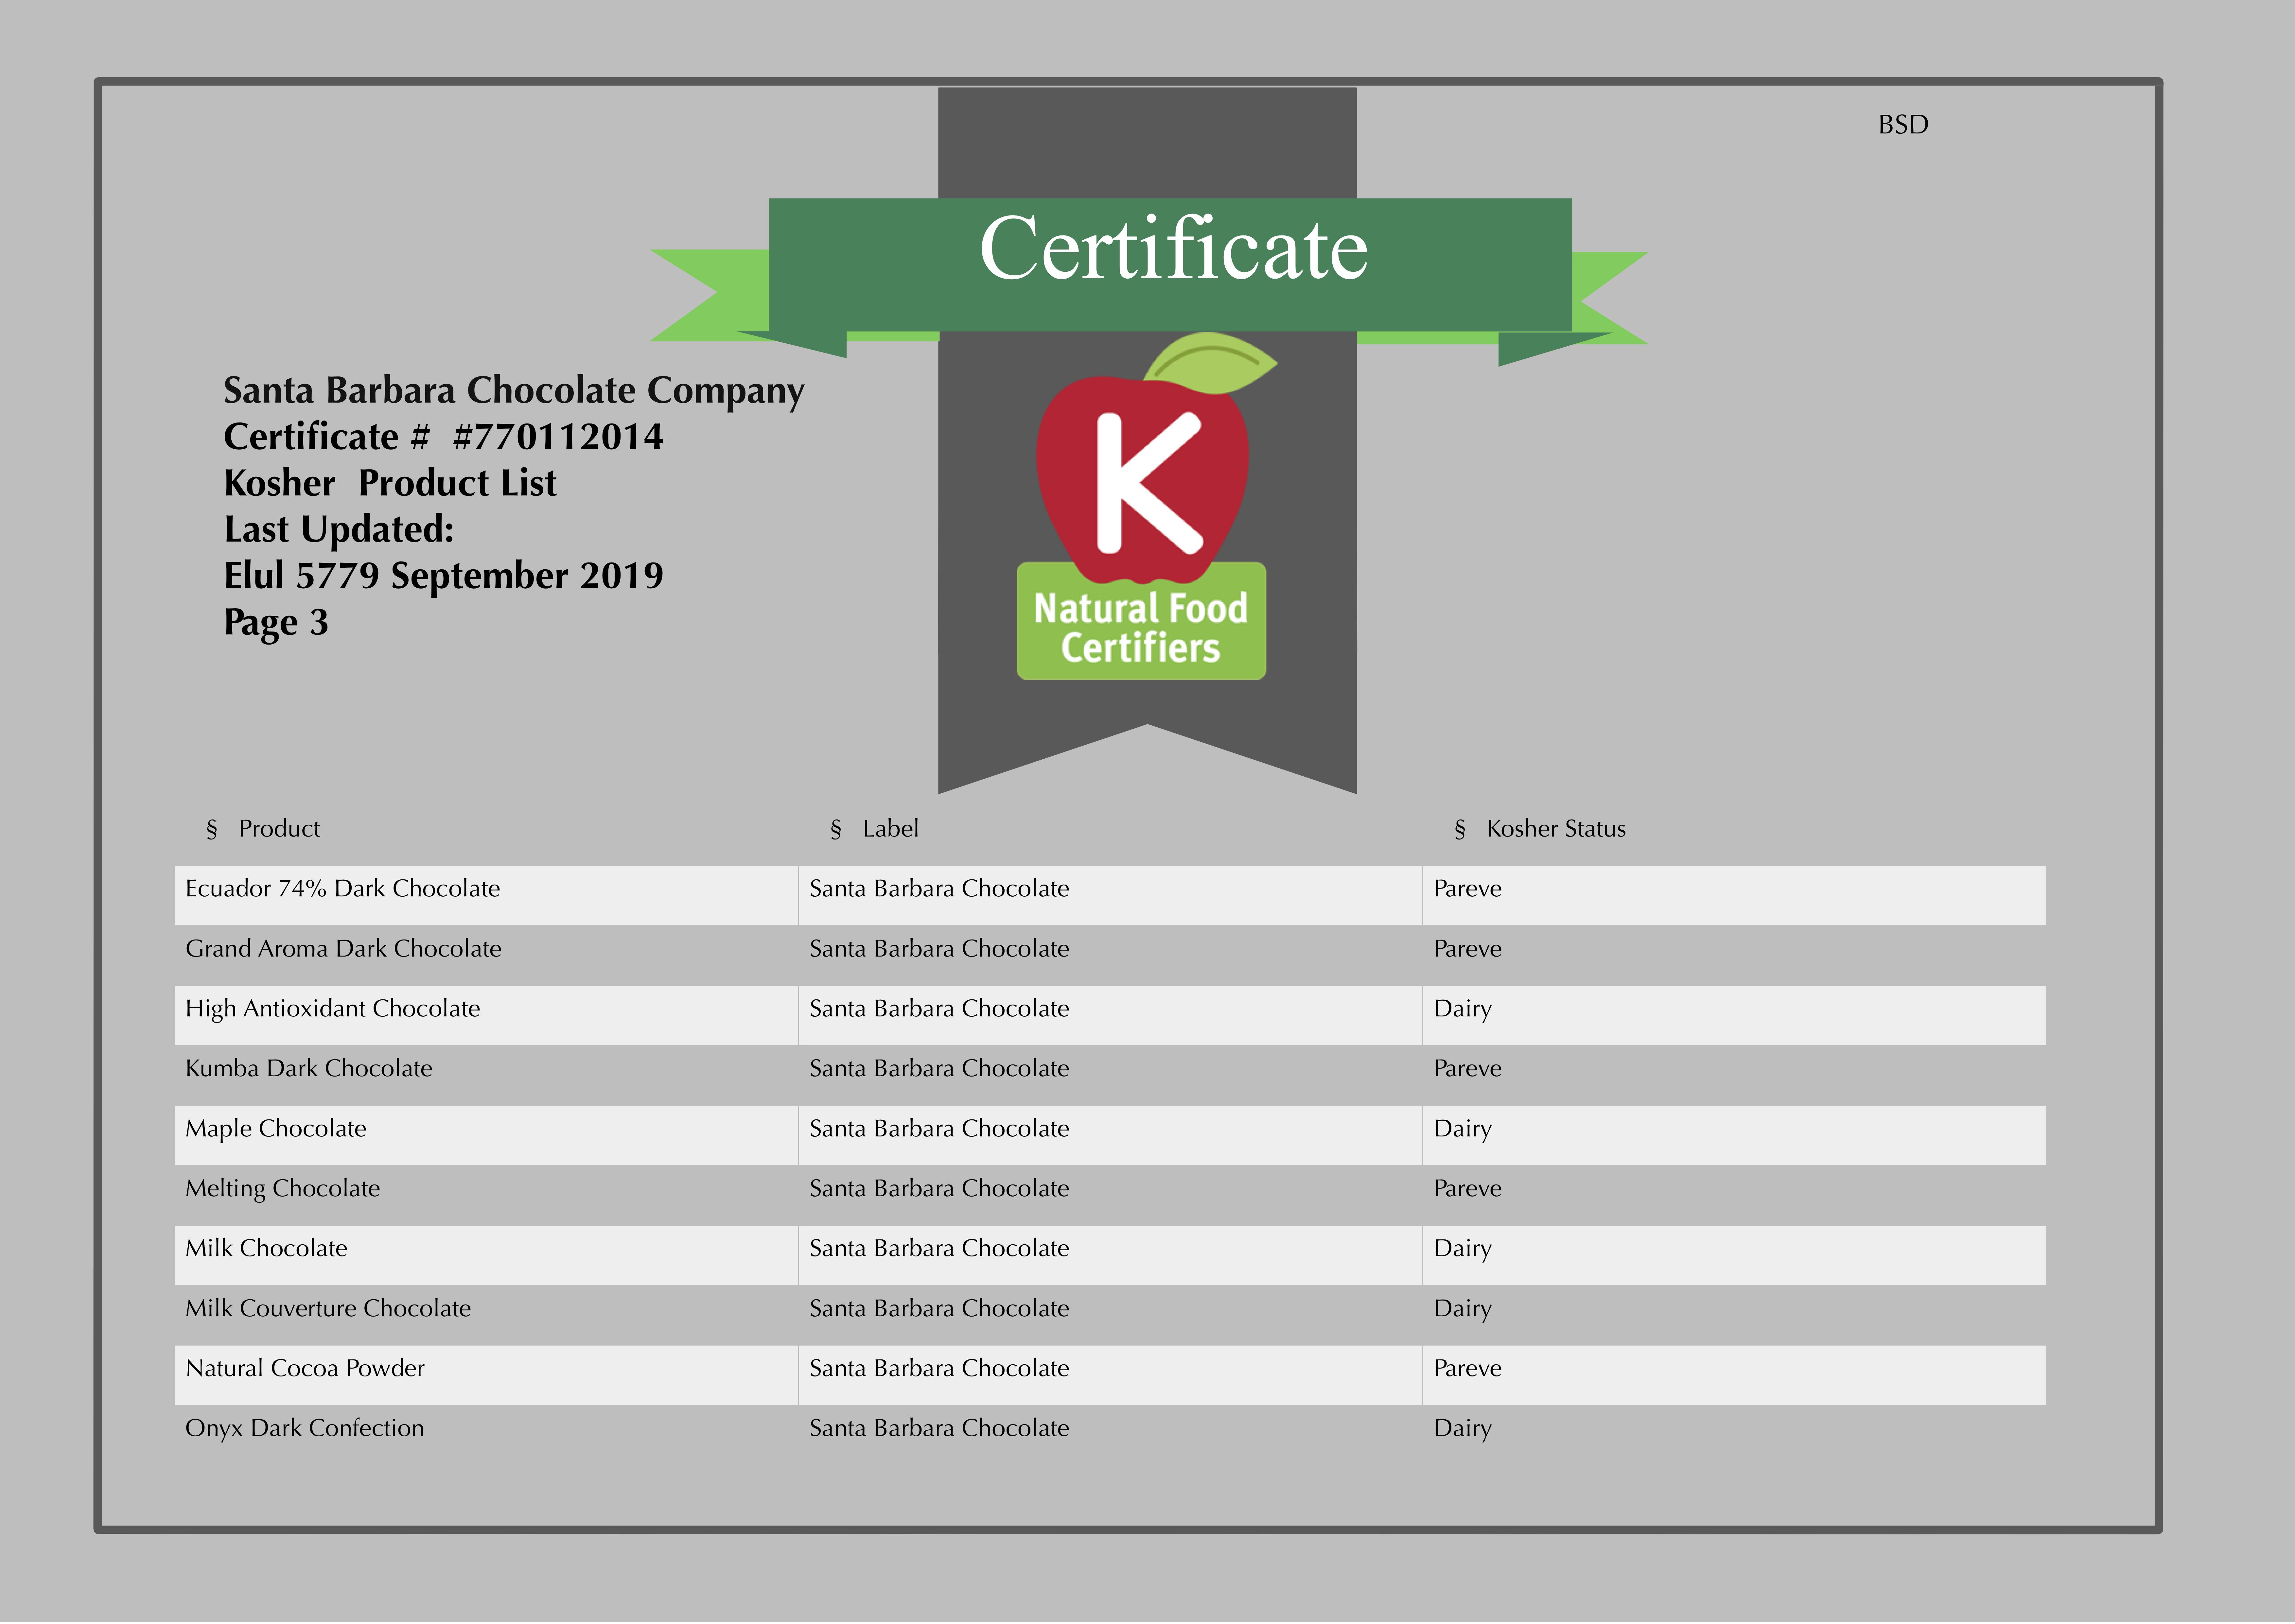 santa-barbara-chocolate-kosher-certificate-2019-2020-page-4.jpg